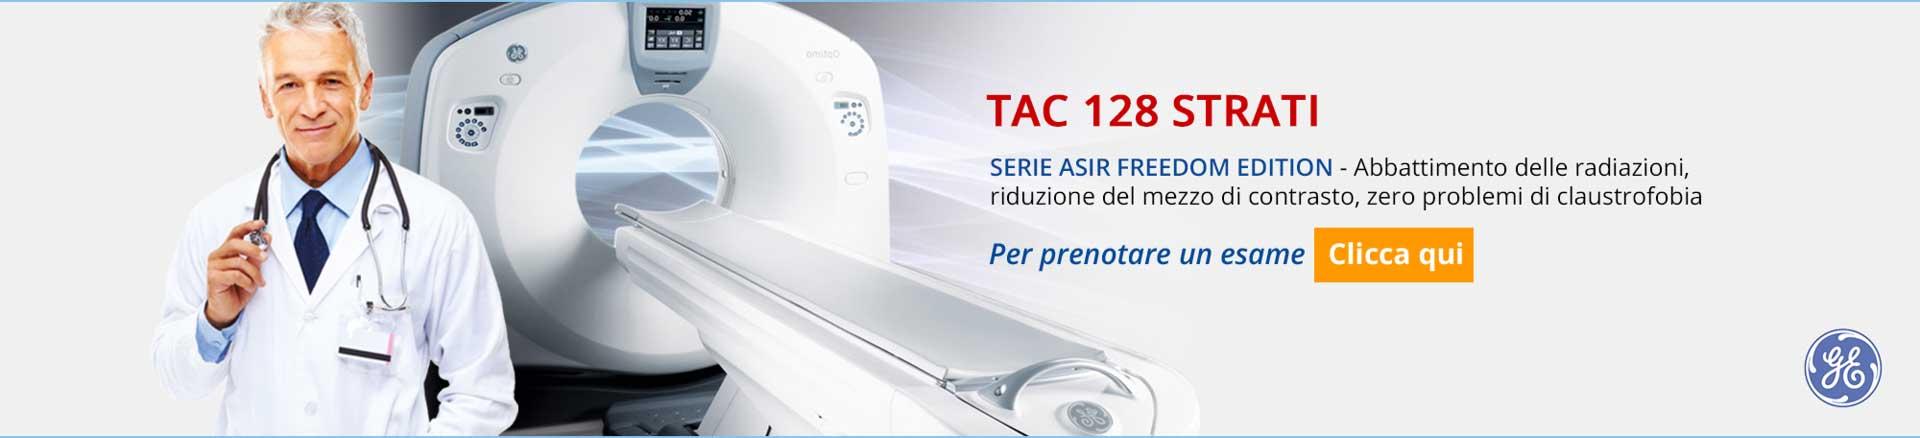 Esame TAC 128 Strati Ostia